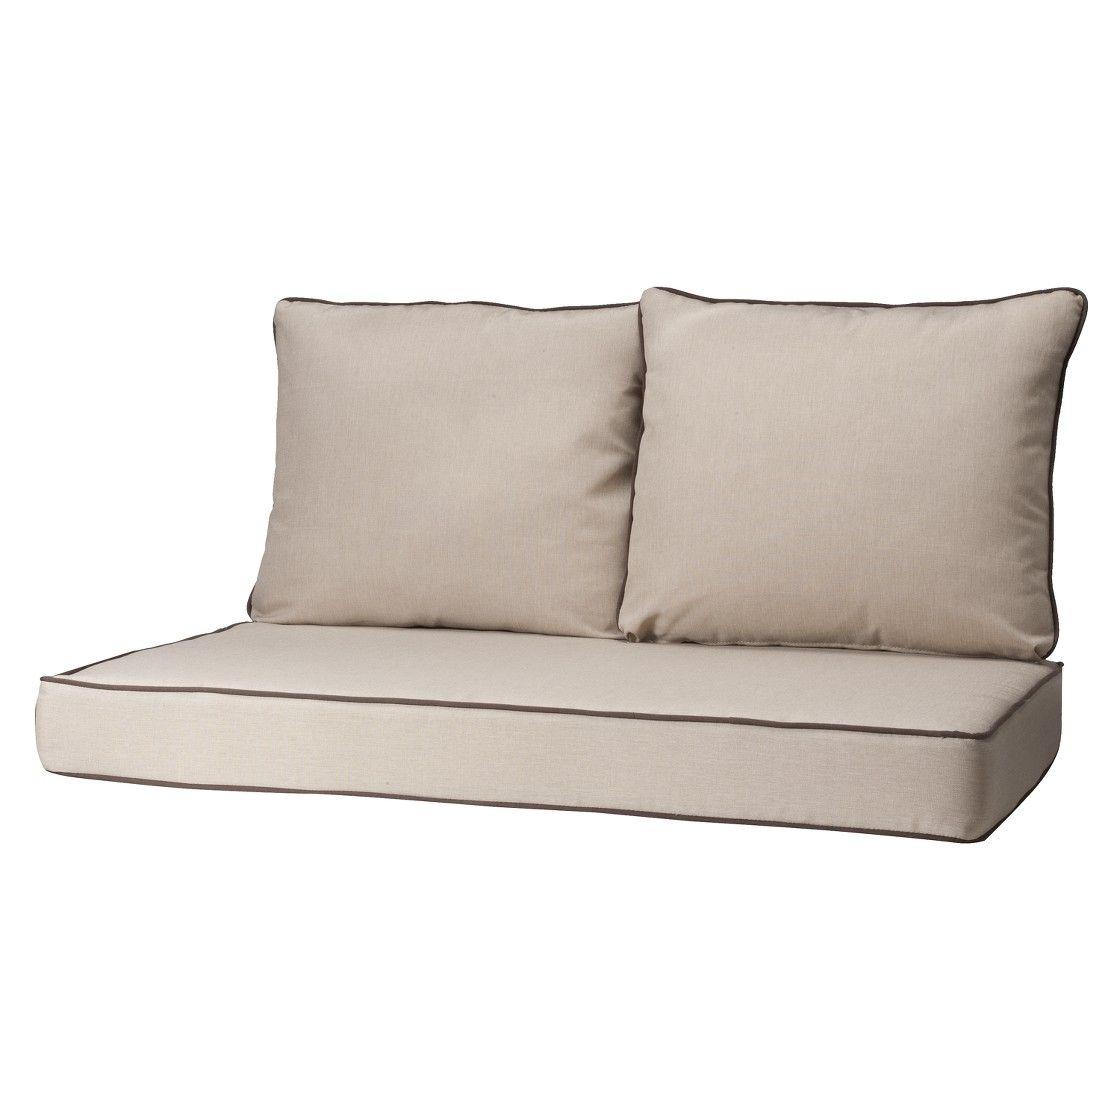 Rolston 3pc Outdoor Replacement Loveseat Sofa Cushion Set Haven Way Cushions On Sofa Love Seat Loveseat Sofa